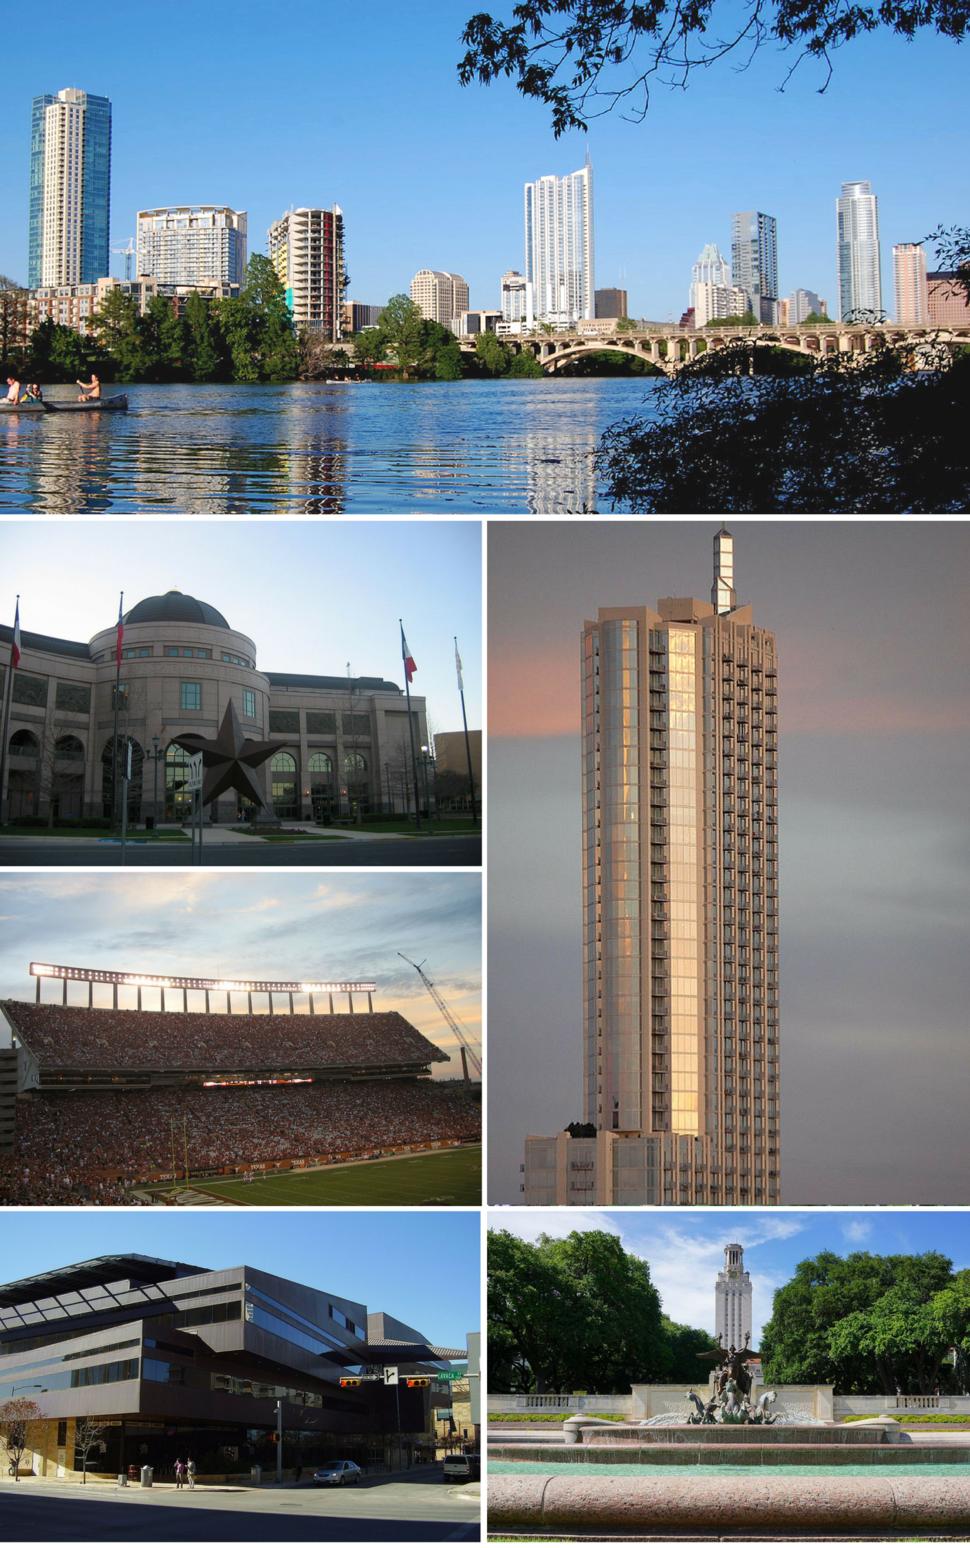 Downtown skyline, Bob Bullock Texas History Museum, 360 Condominiums Tower, Darrell K Royal–Texas Memorial Stadium, Austin City Hall, University of Texas at Austin